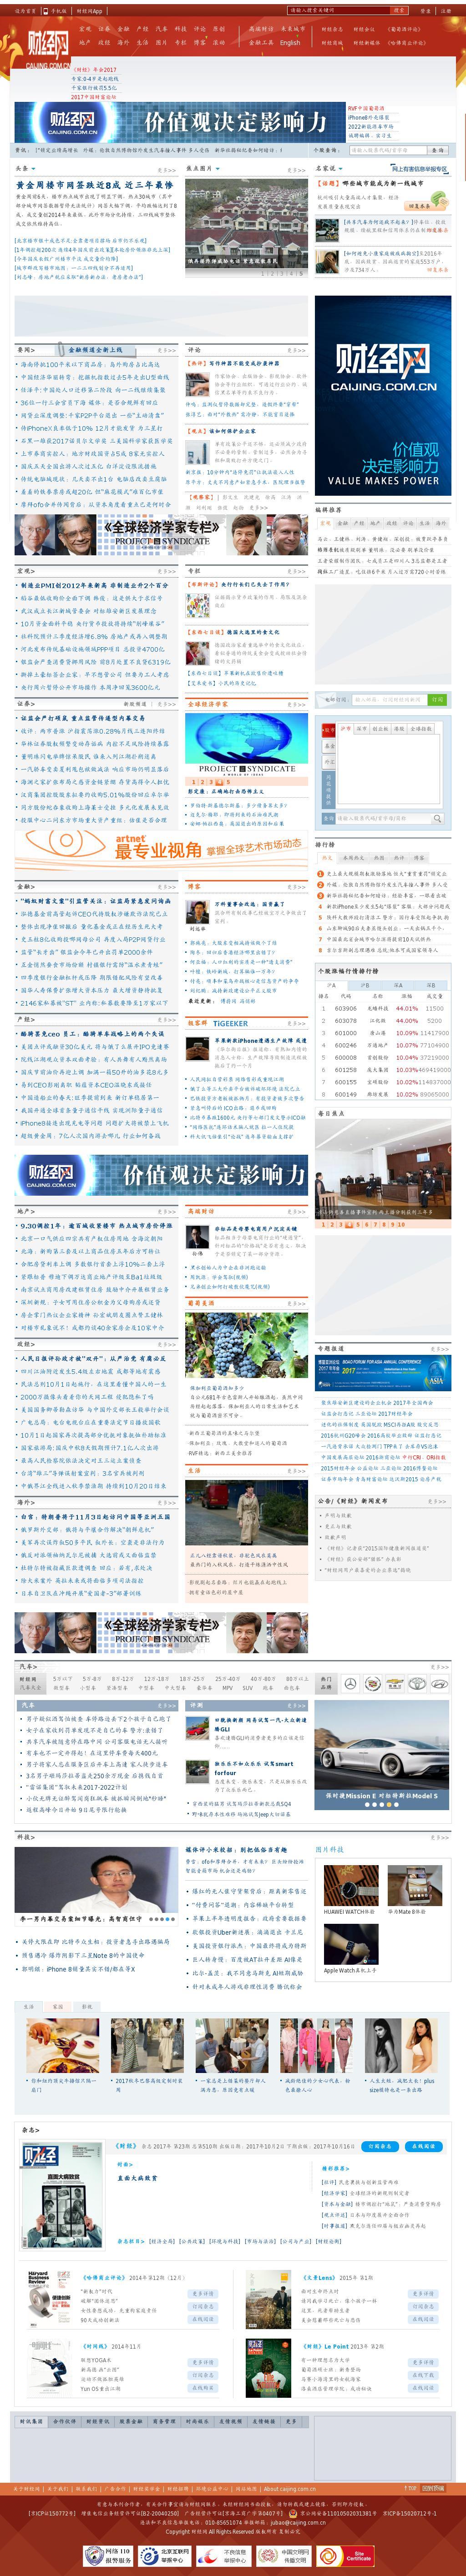 Caijing at Saturday Oct. 7, 2017, 11 p.m. UTC